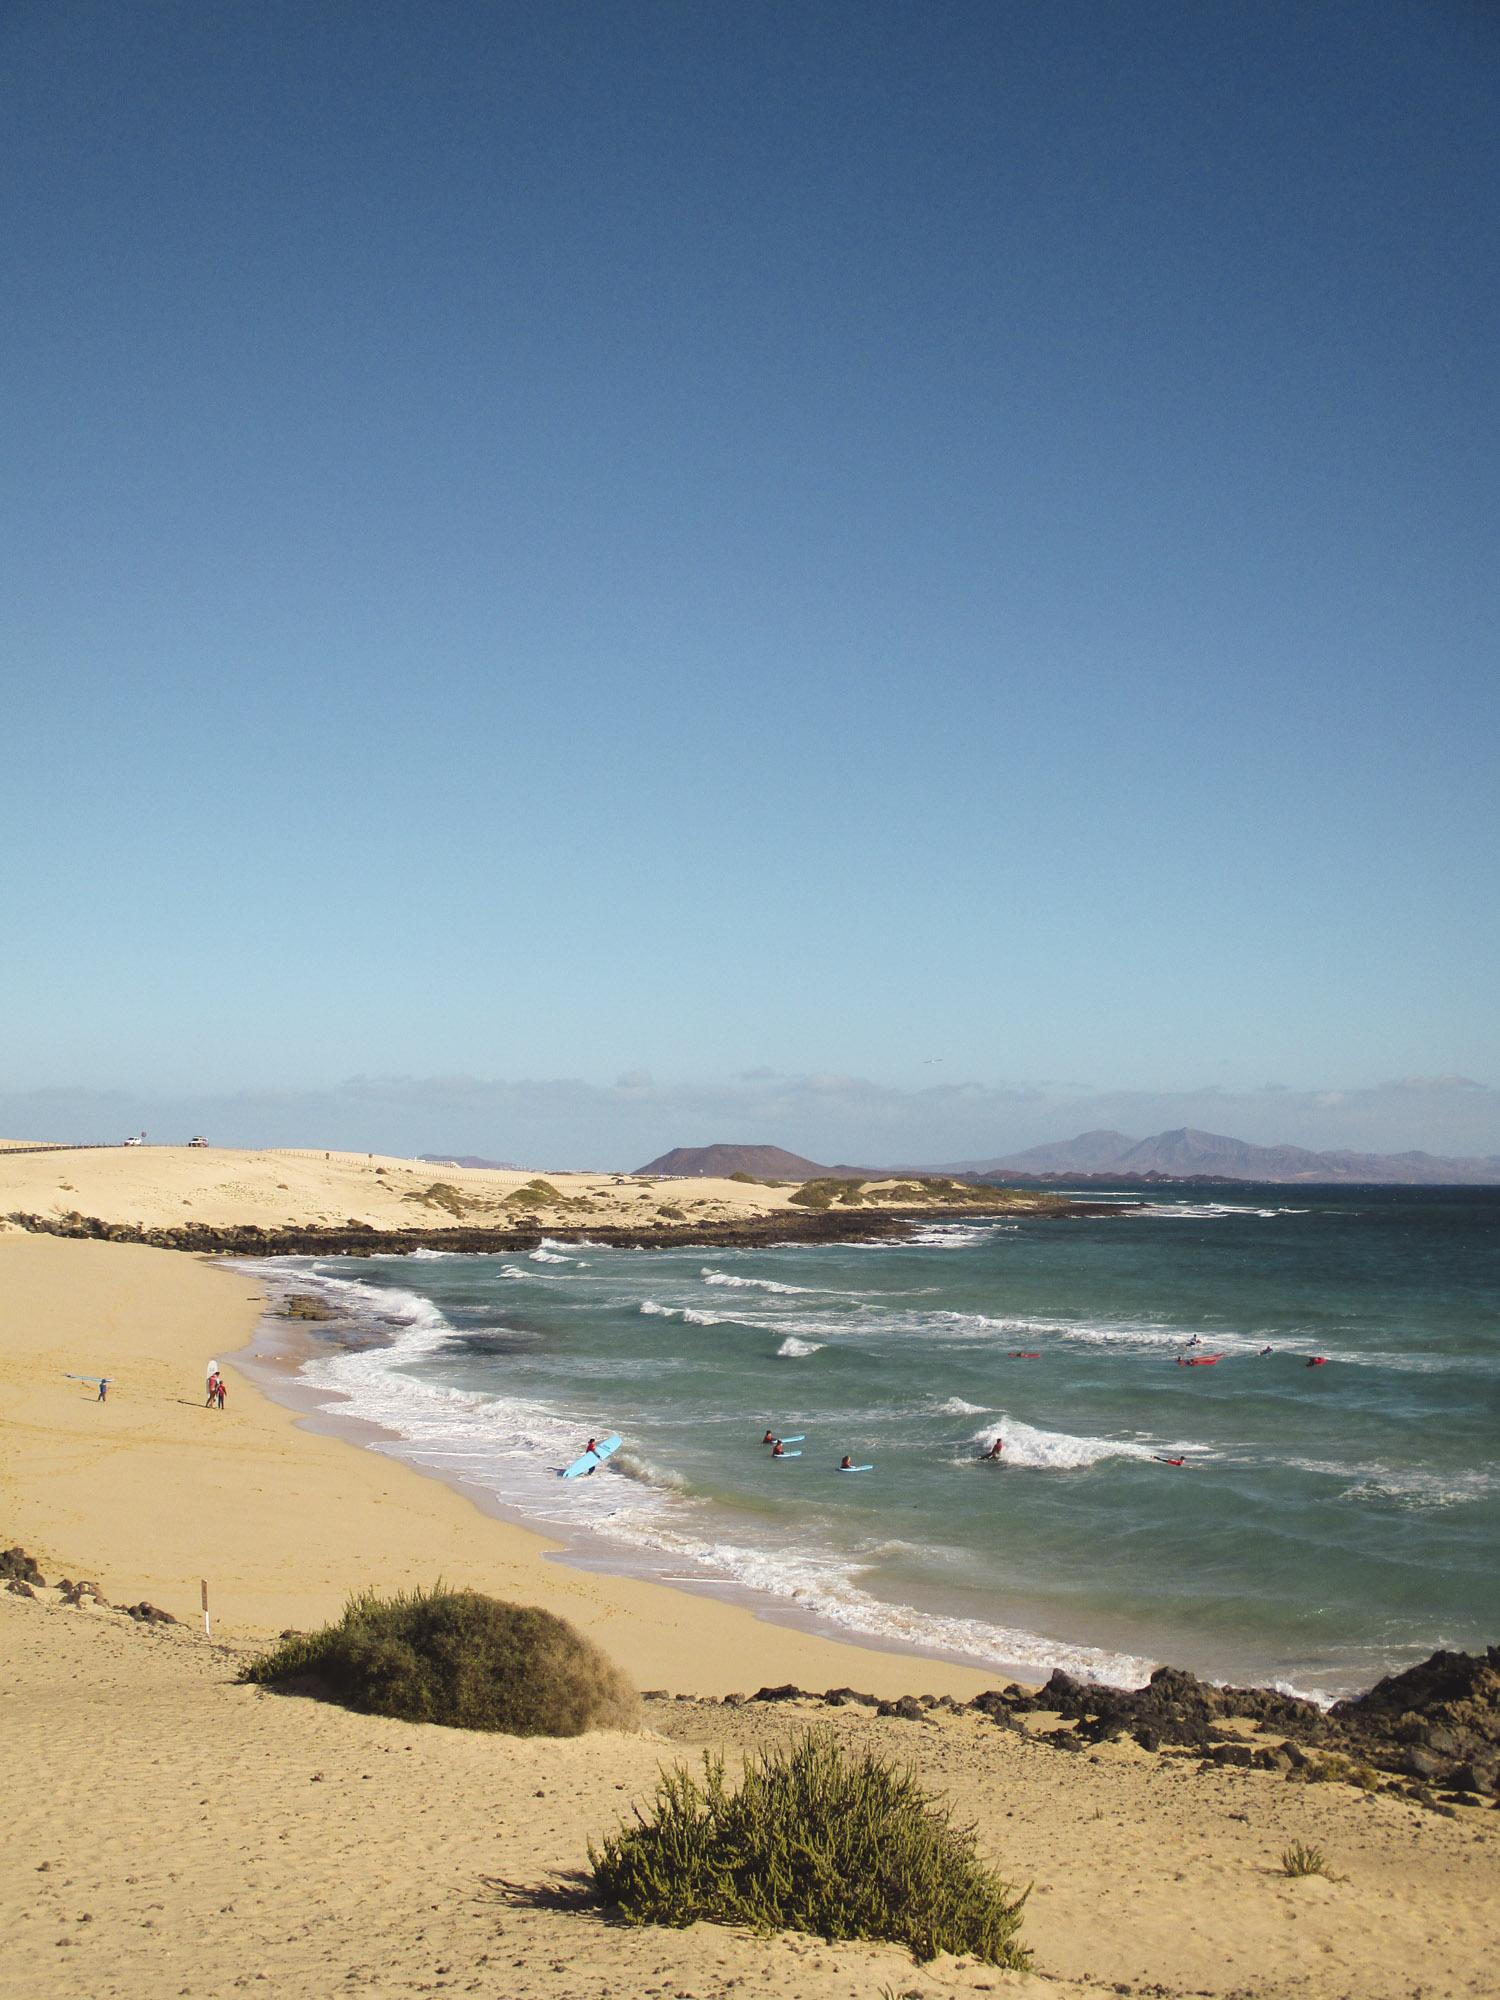 190219_Fuerteventura Kleine KameraIMG_2112.jpg